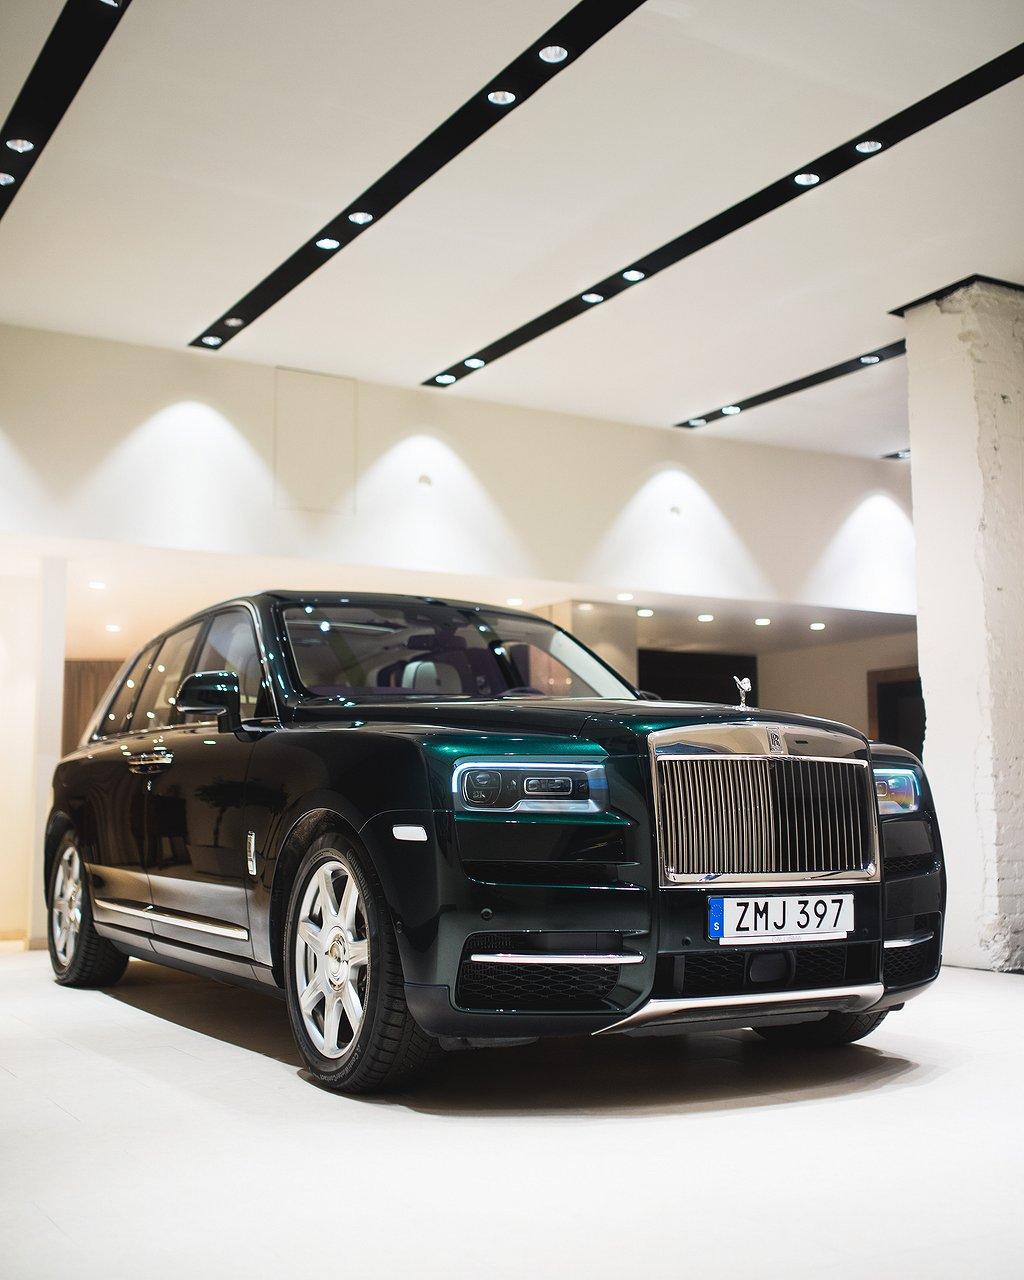 Rolls-Royce CULLINAN 6.75 V12 Automat Euro 6 571hk